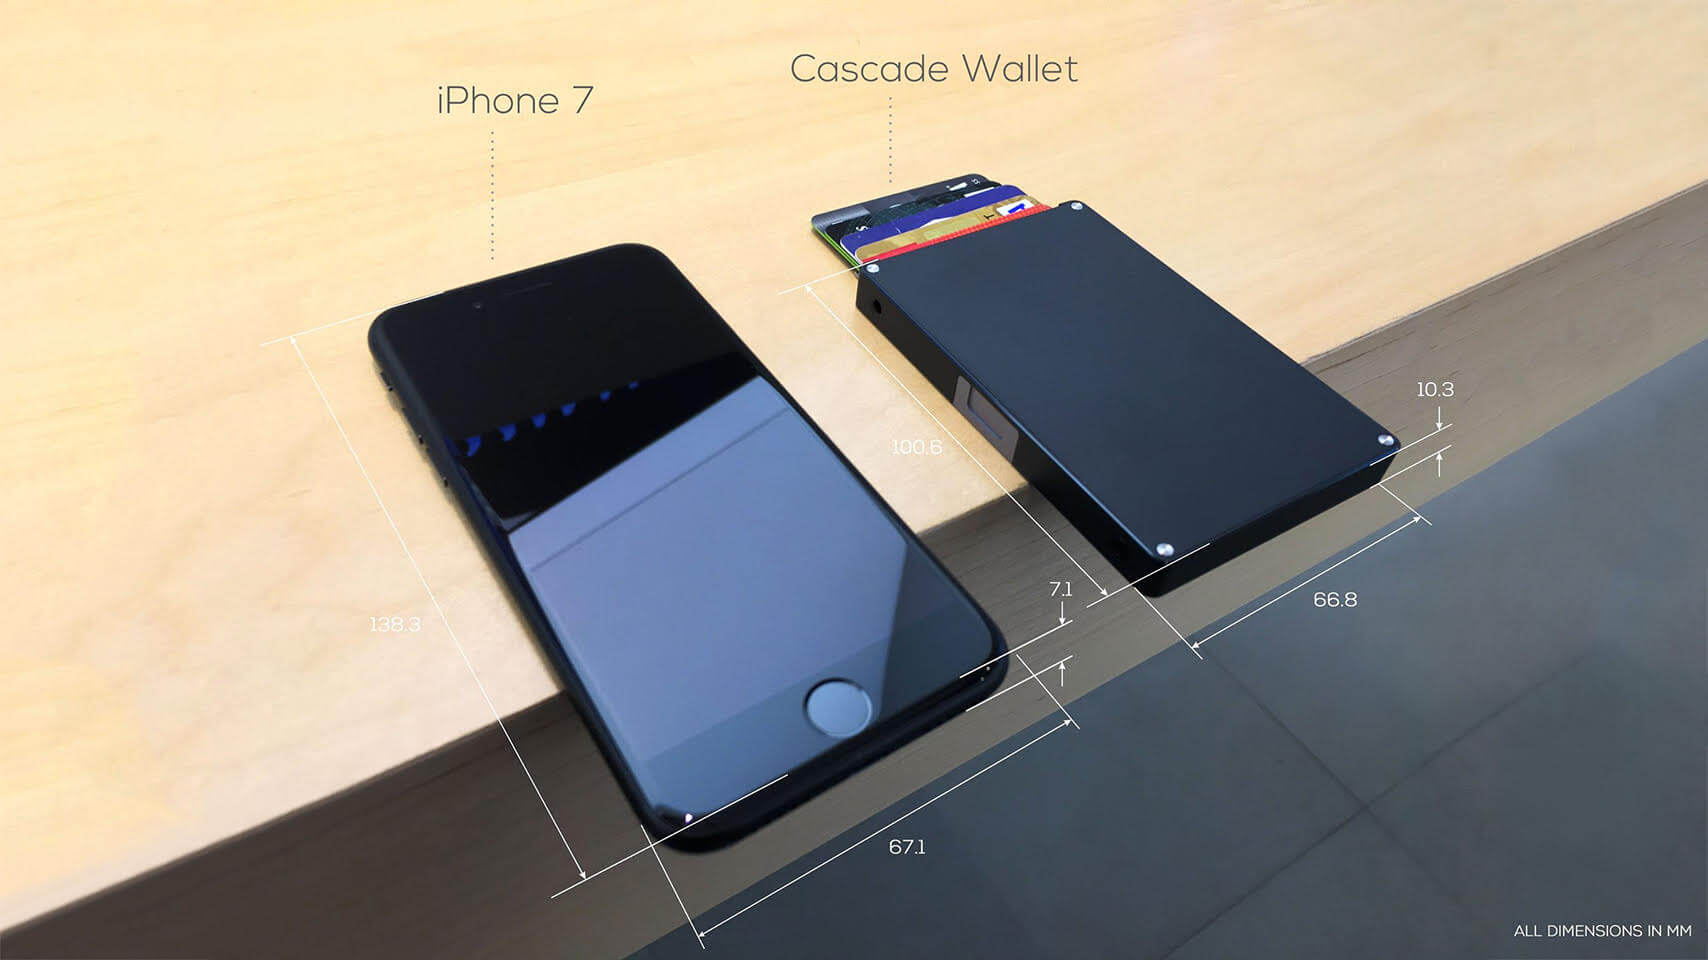 cascade wallet smartphone